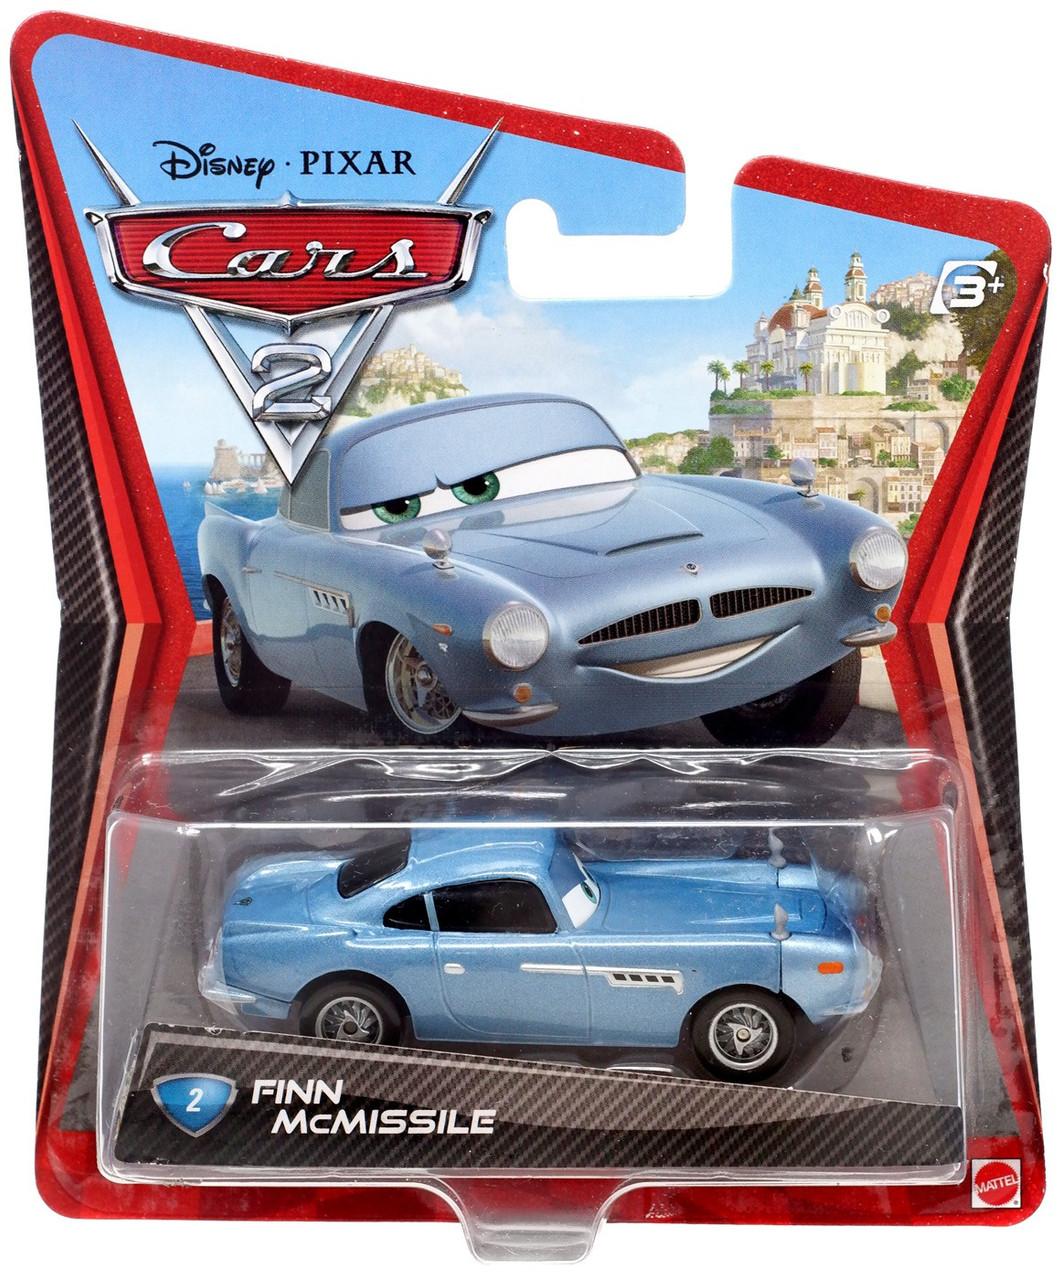 disney pixar cars cars 2 main series finn mcmissile 155